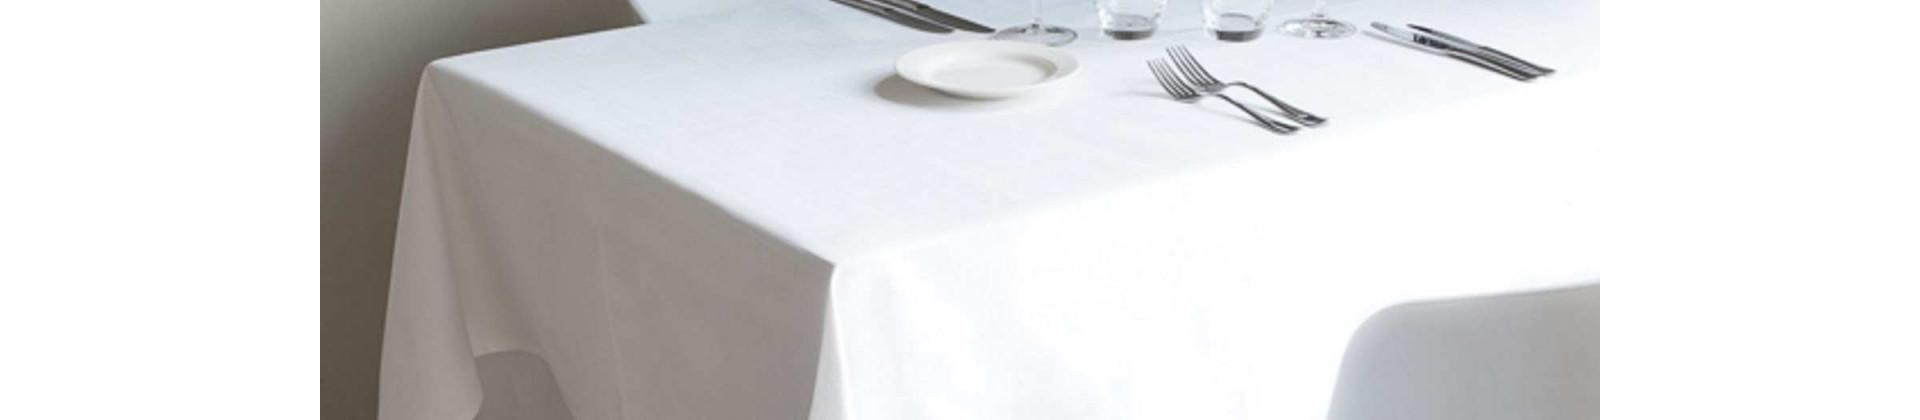 Nappes restaurant & hôtellerie - Grossiste nappe de table | CTH